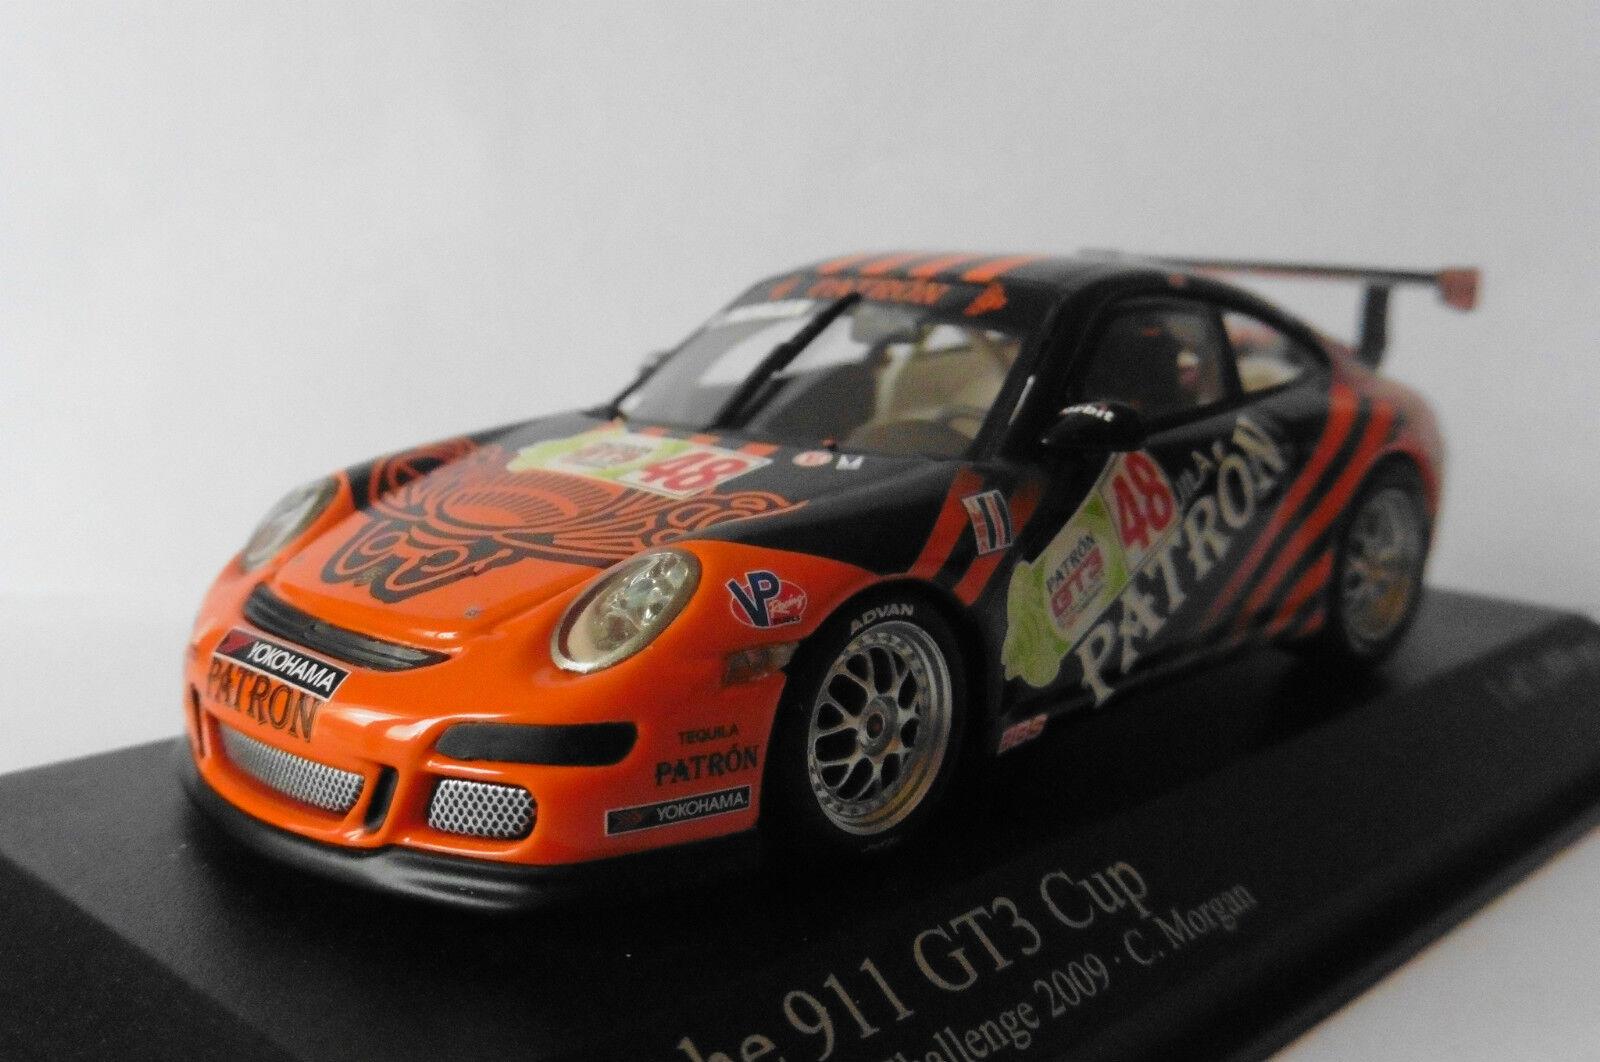 PORSCHE 911 997 GT3 CUP  48 IMSA CHALLENGE 2009 MORGAN MINICHAMPS 400096748 1/43